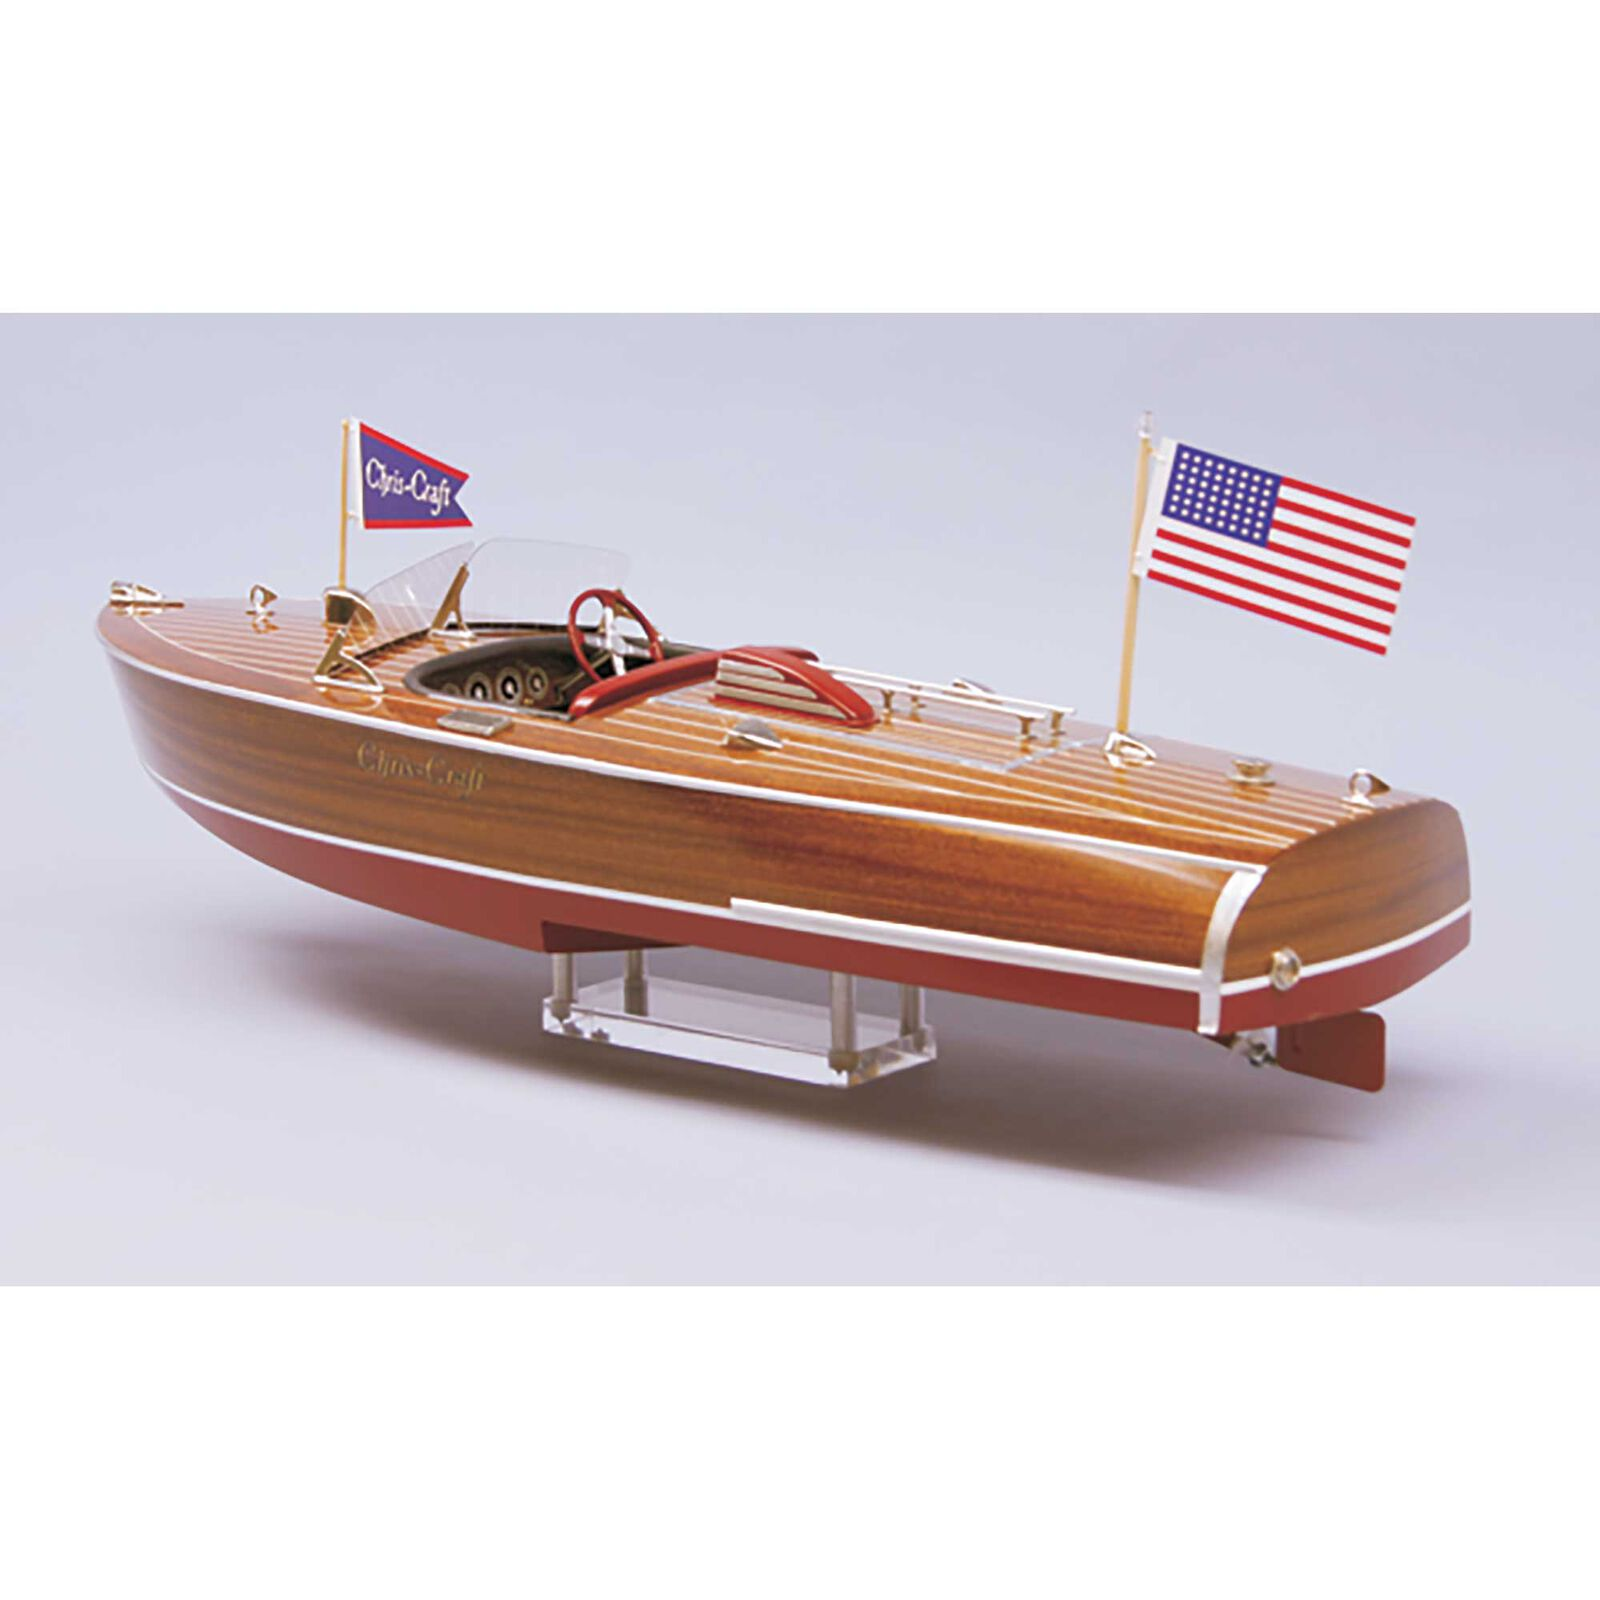 "1/8 1941 Chris-Craft Hydroplane Boat Kit, 24"""